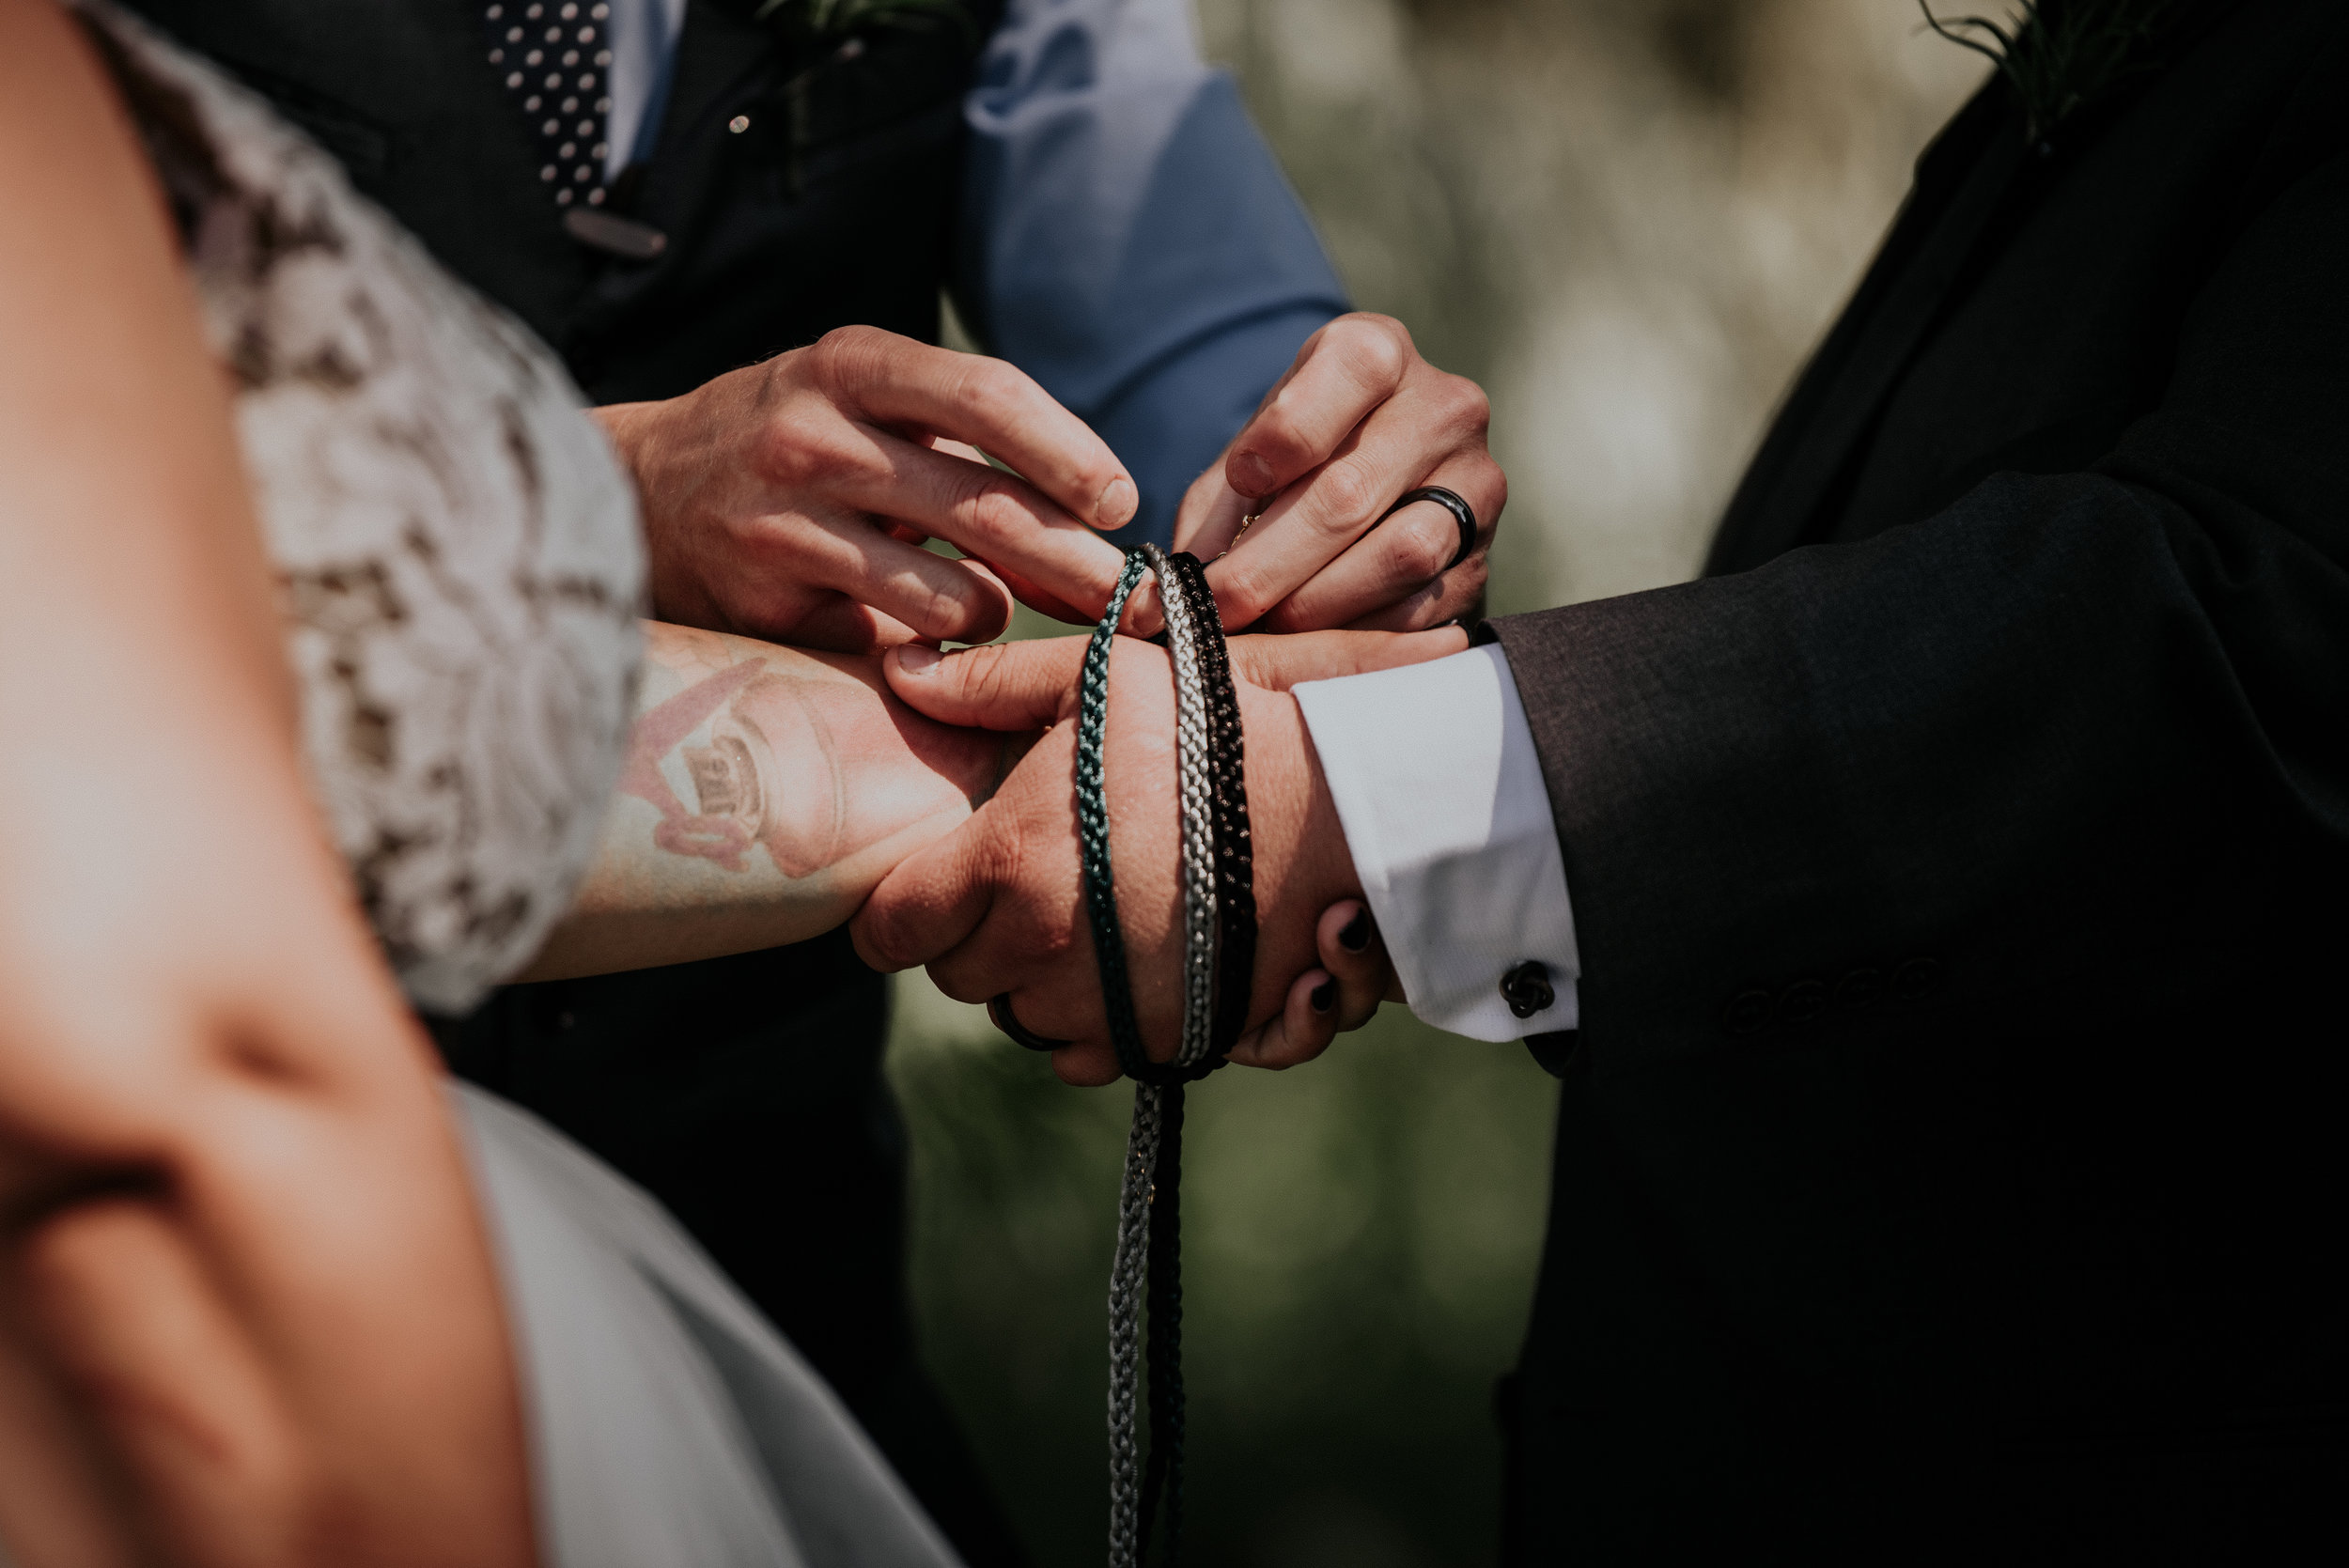 BridesbyYoung-RealWedding-PlusSizeBridal-BillyCourtney-JurassicParkTheme-27.jpg